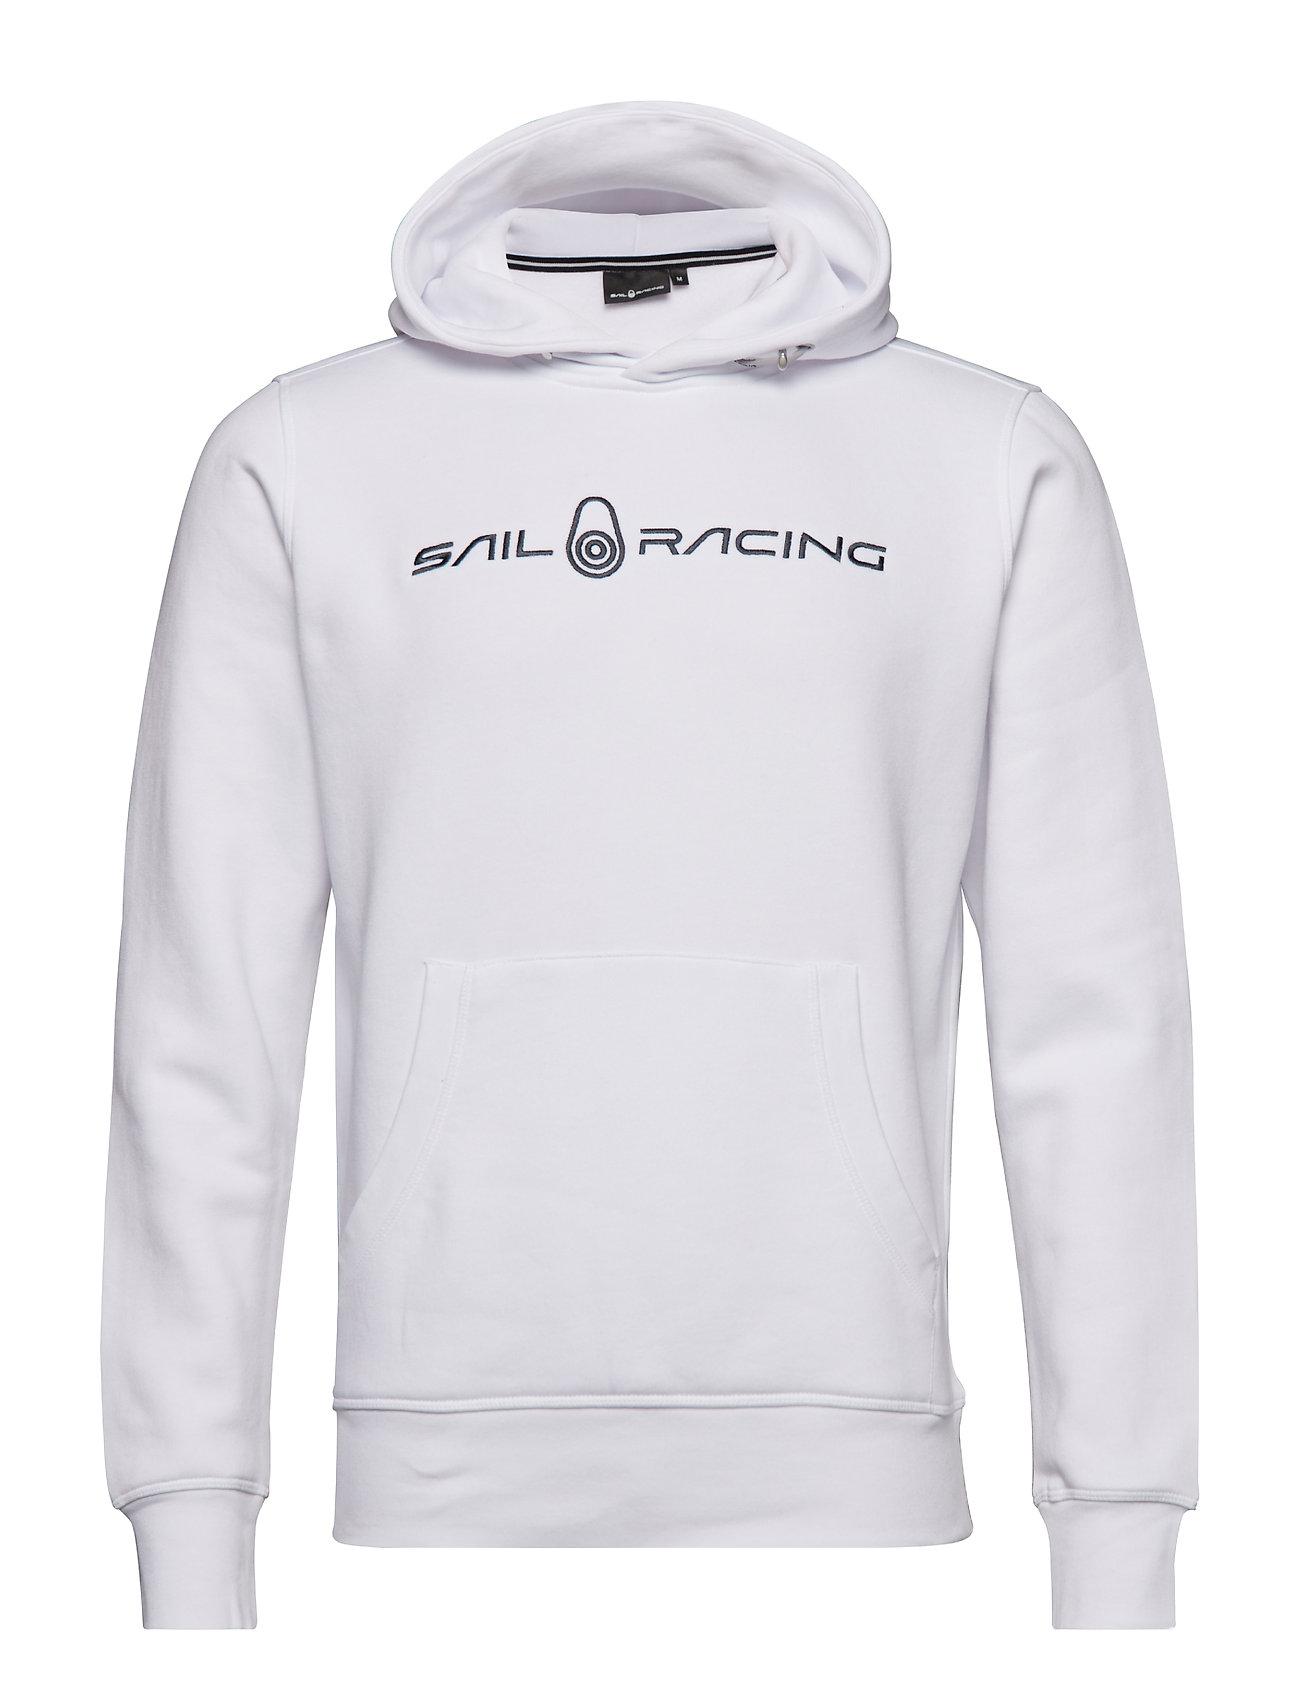 Sail Racing BOWMAN HOOD - WHITE